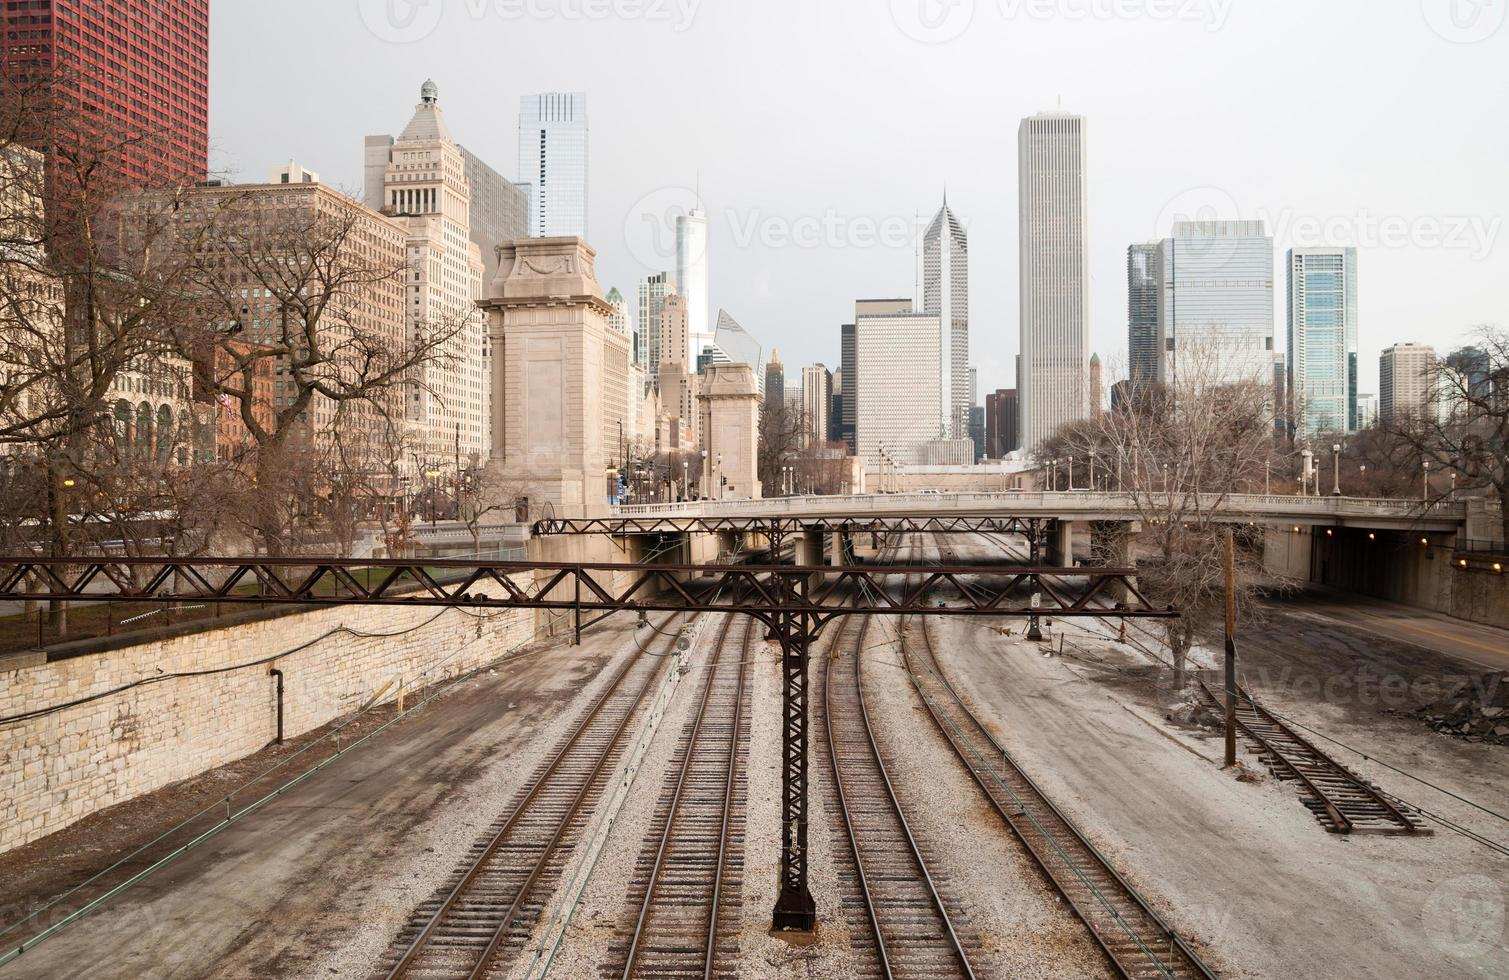 Railroad Train Tracks Railyards Downtown Chicago Skyline Transportation photo